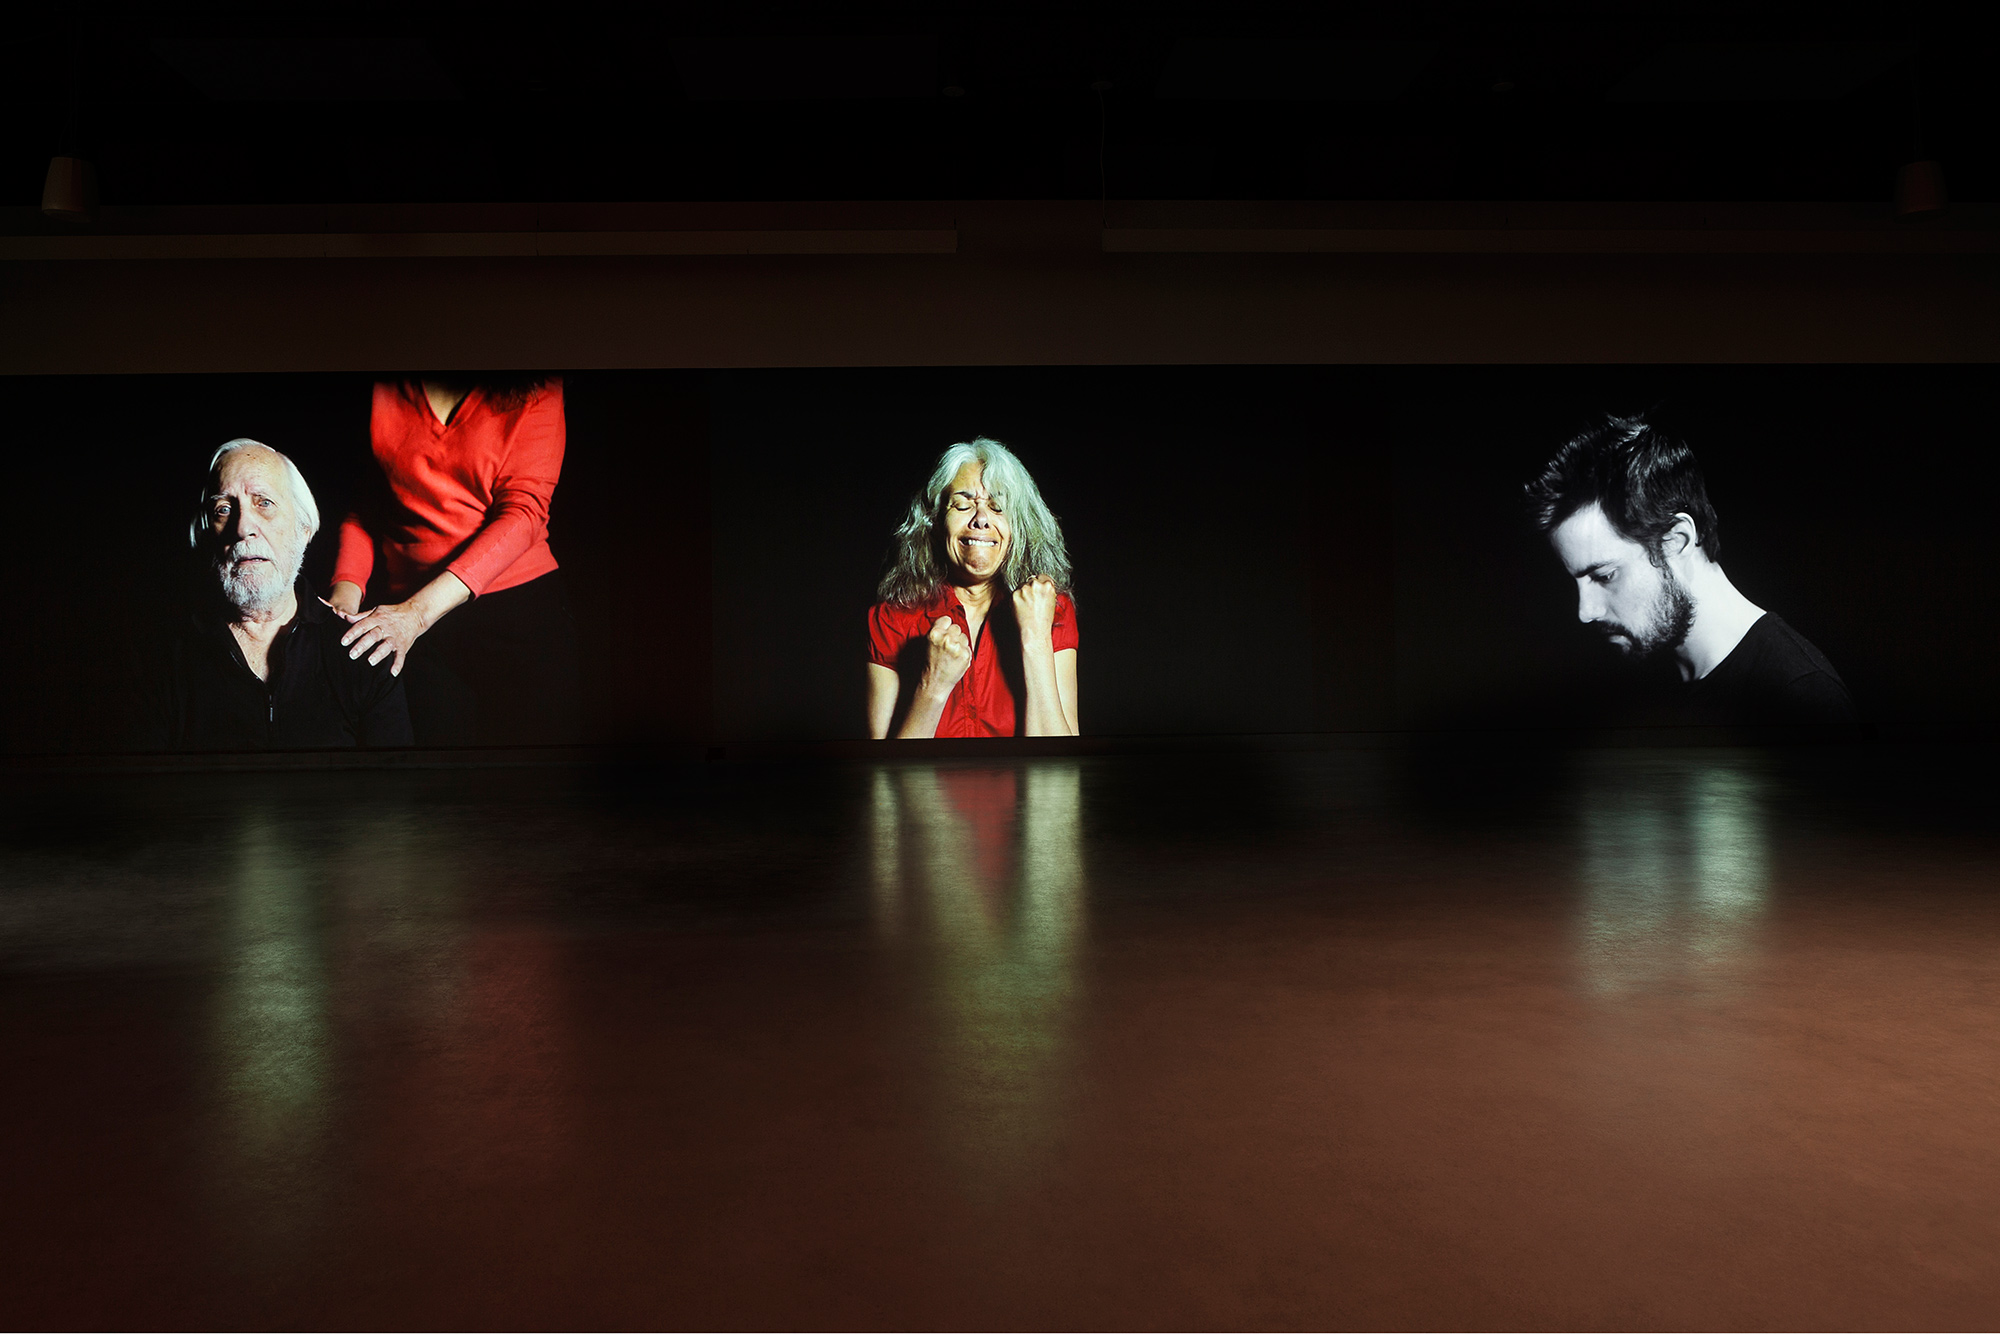 © Nadia Seboussi,  Hidad  (2015). Exhibition view. Photo: Marilou Crispin.